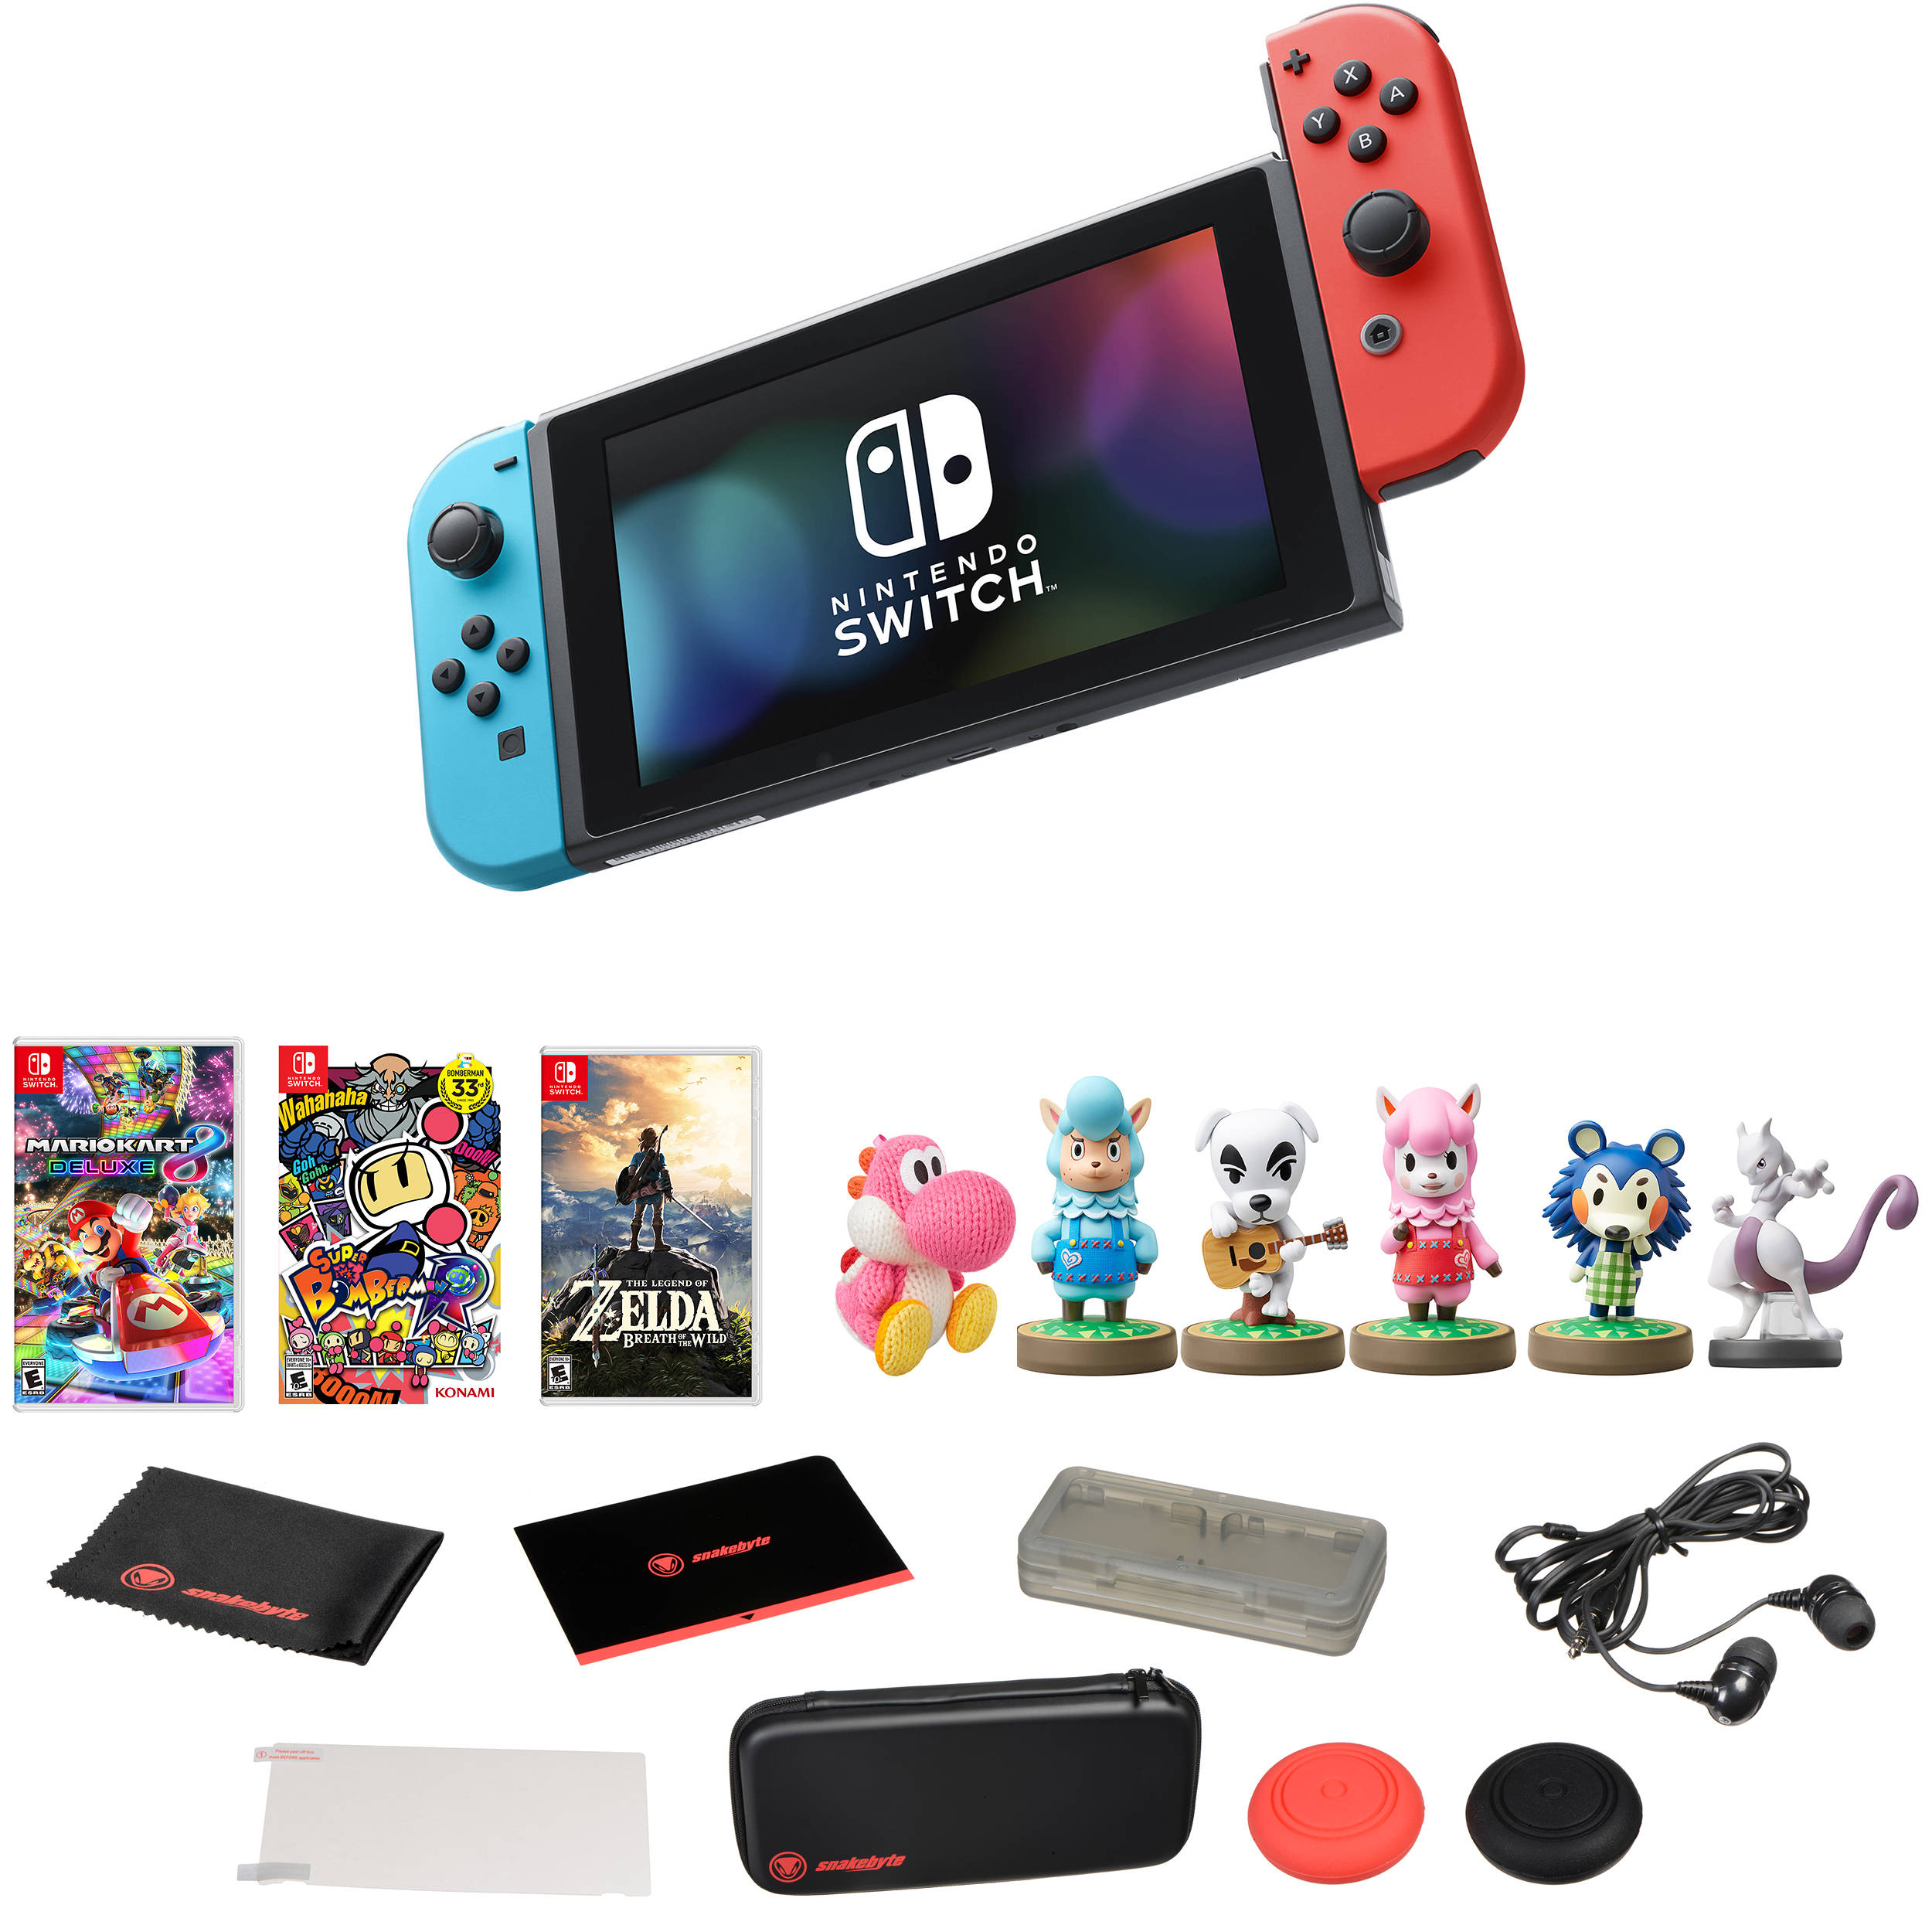 Nintendo Switch with Three Games & amiibo Kit B&H Photo